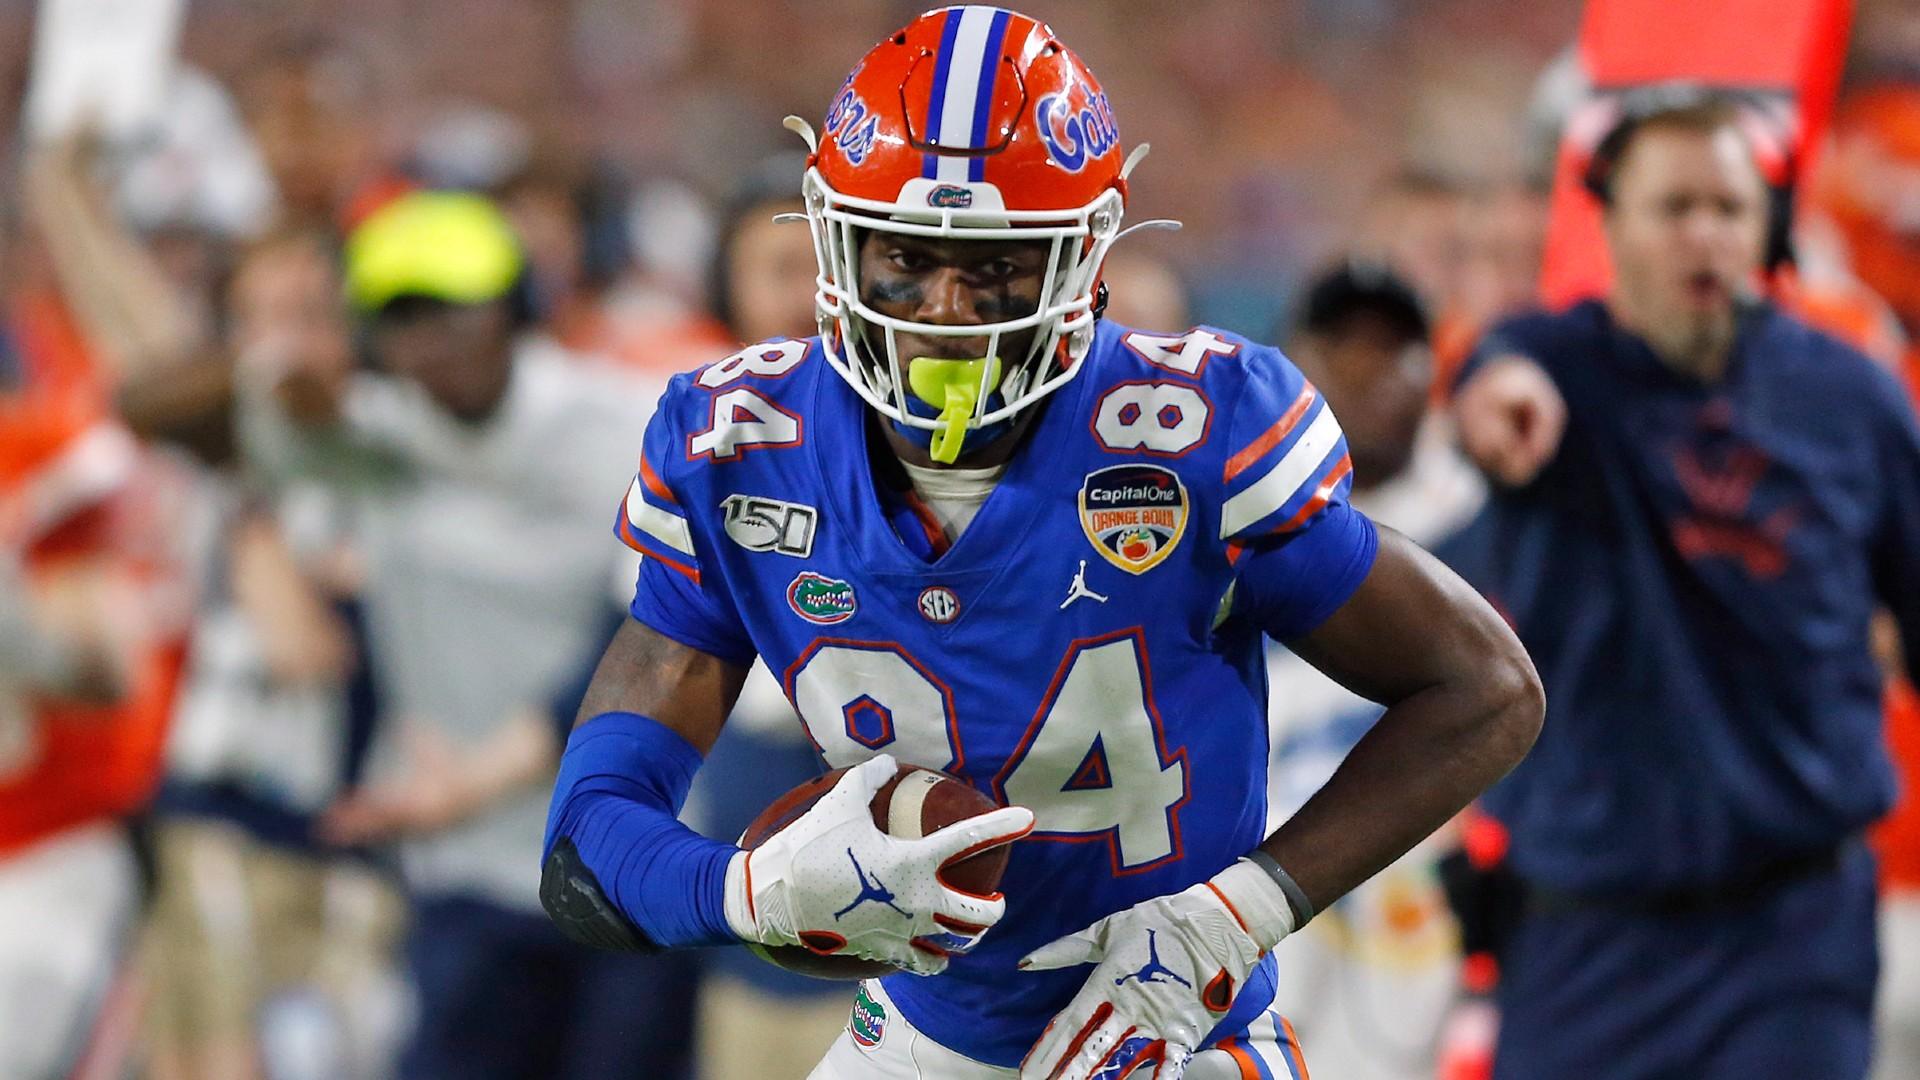 Falcons' 2021 Draft Pick: When Will Atlanta Pick Next?  Full list of NFL Draft selections